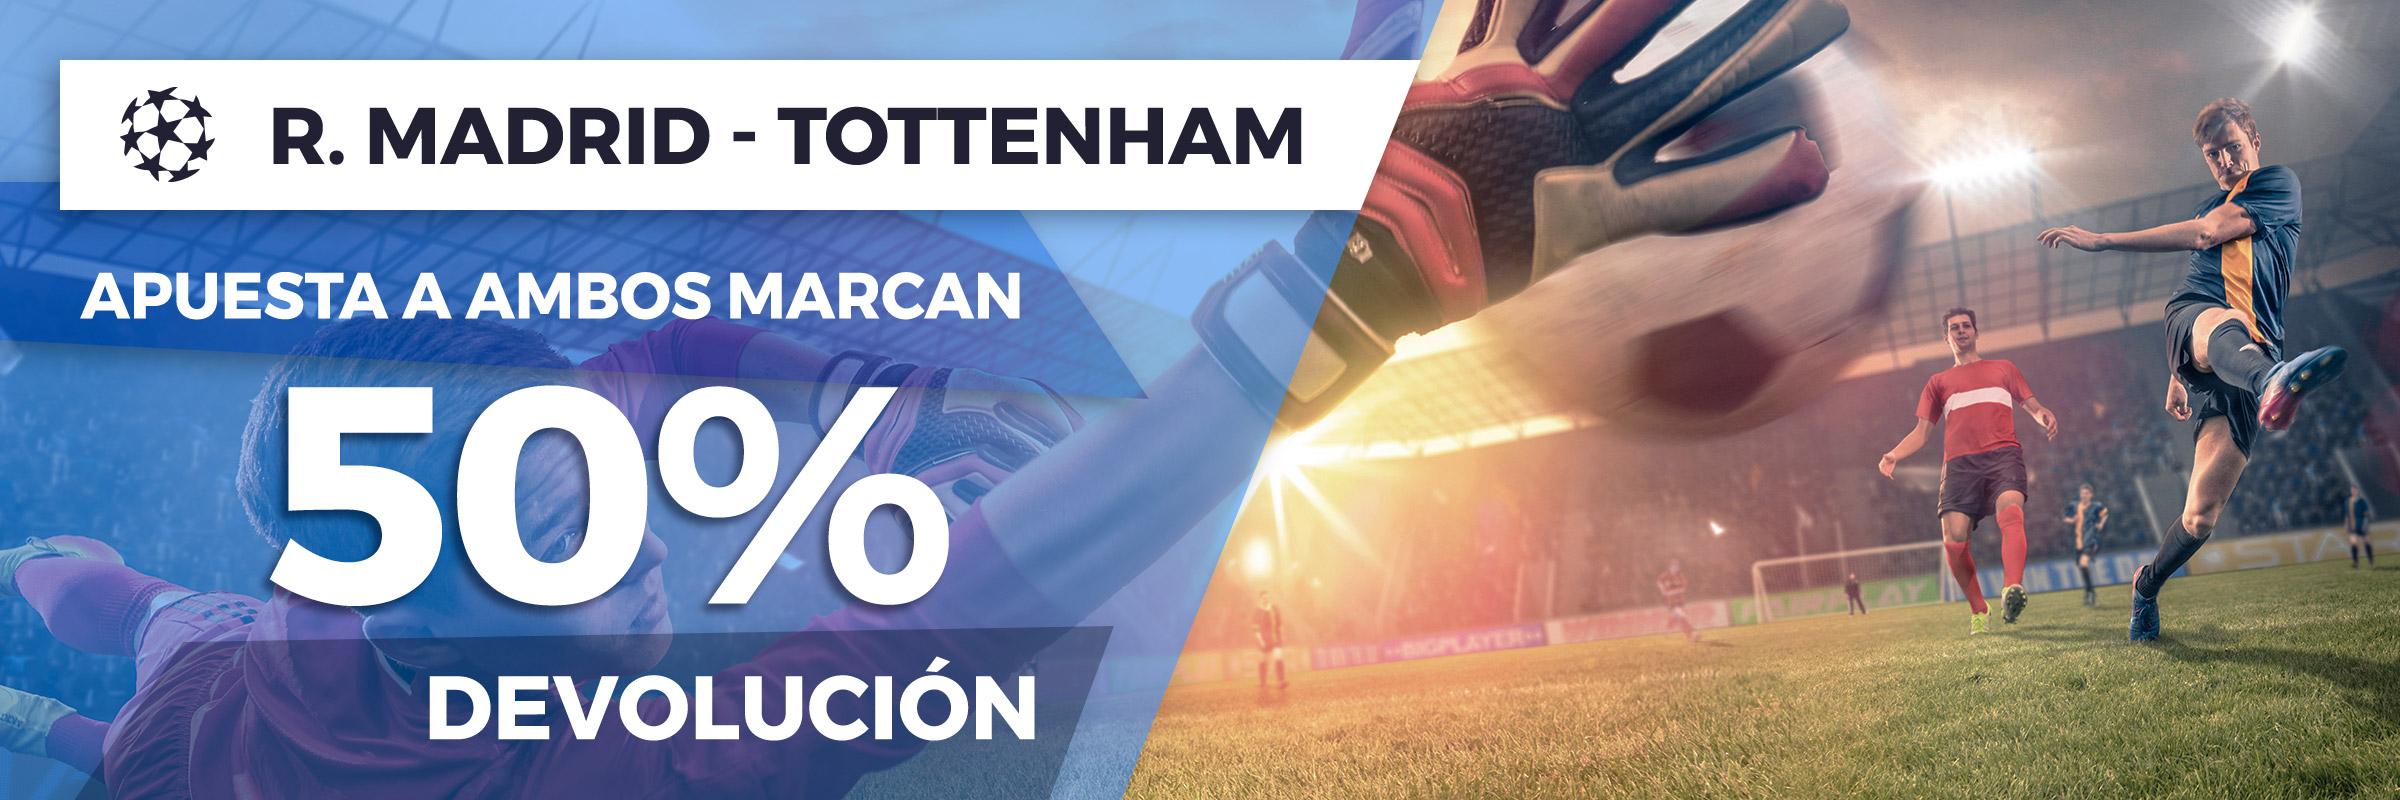 Promoción Champions League: Real Madrid - Tottenham